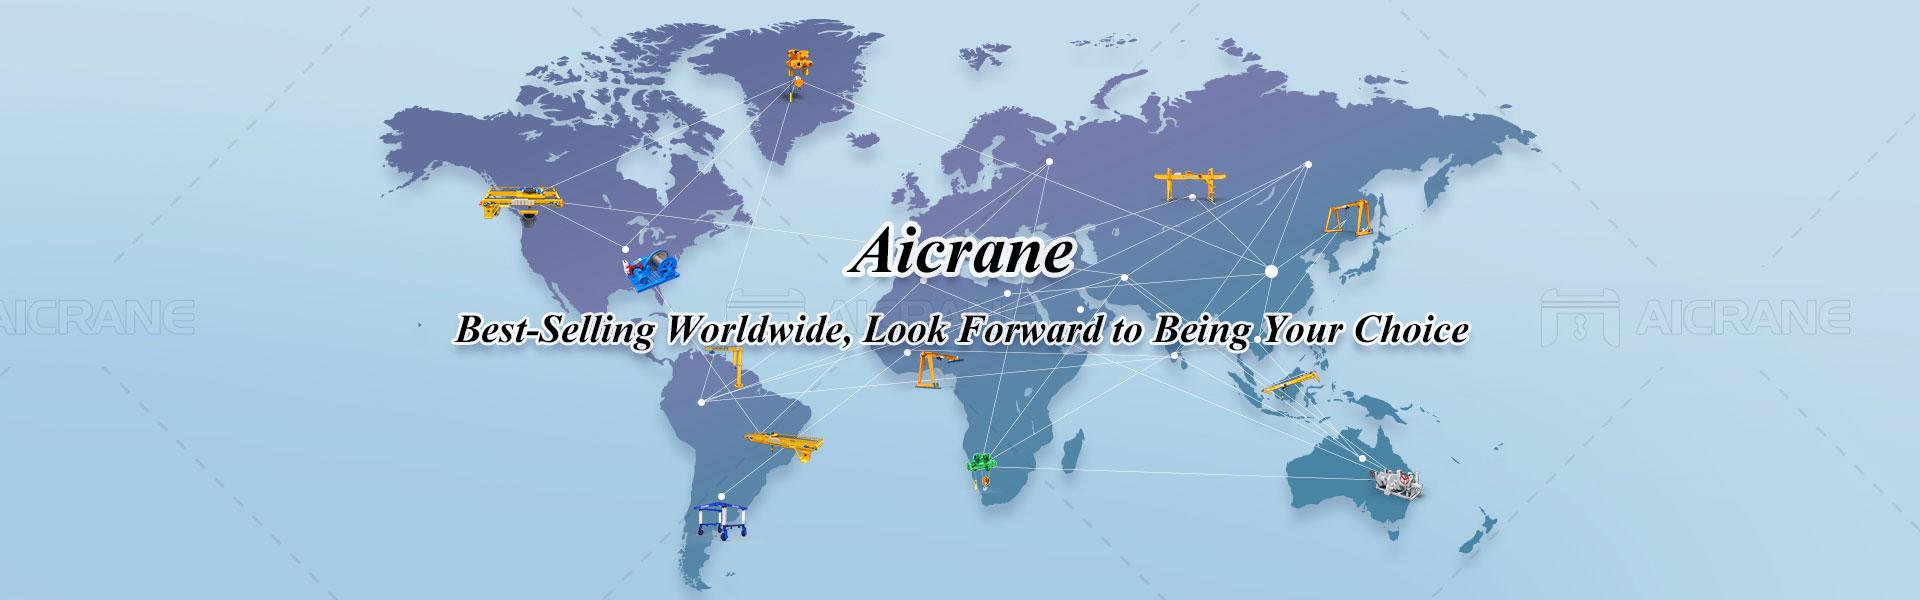 aicrane-heavy-crane-worldwide